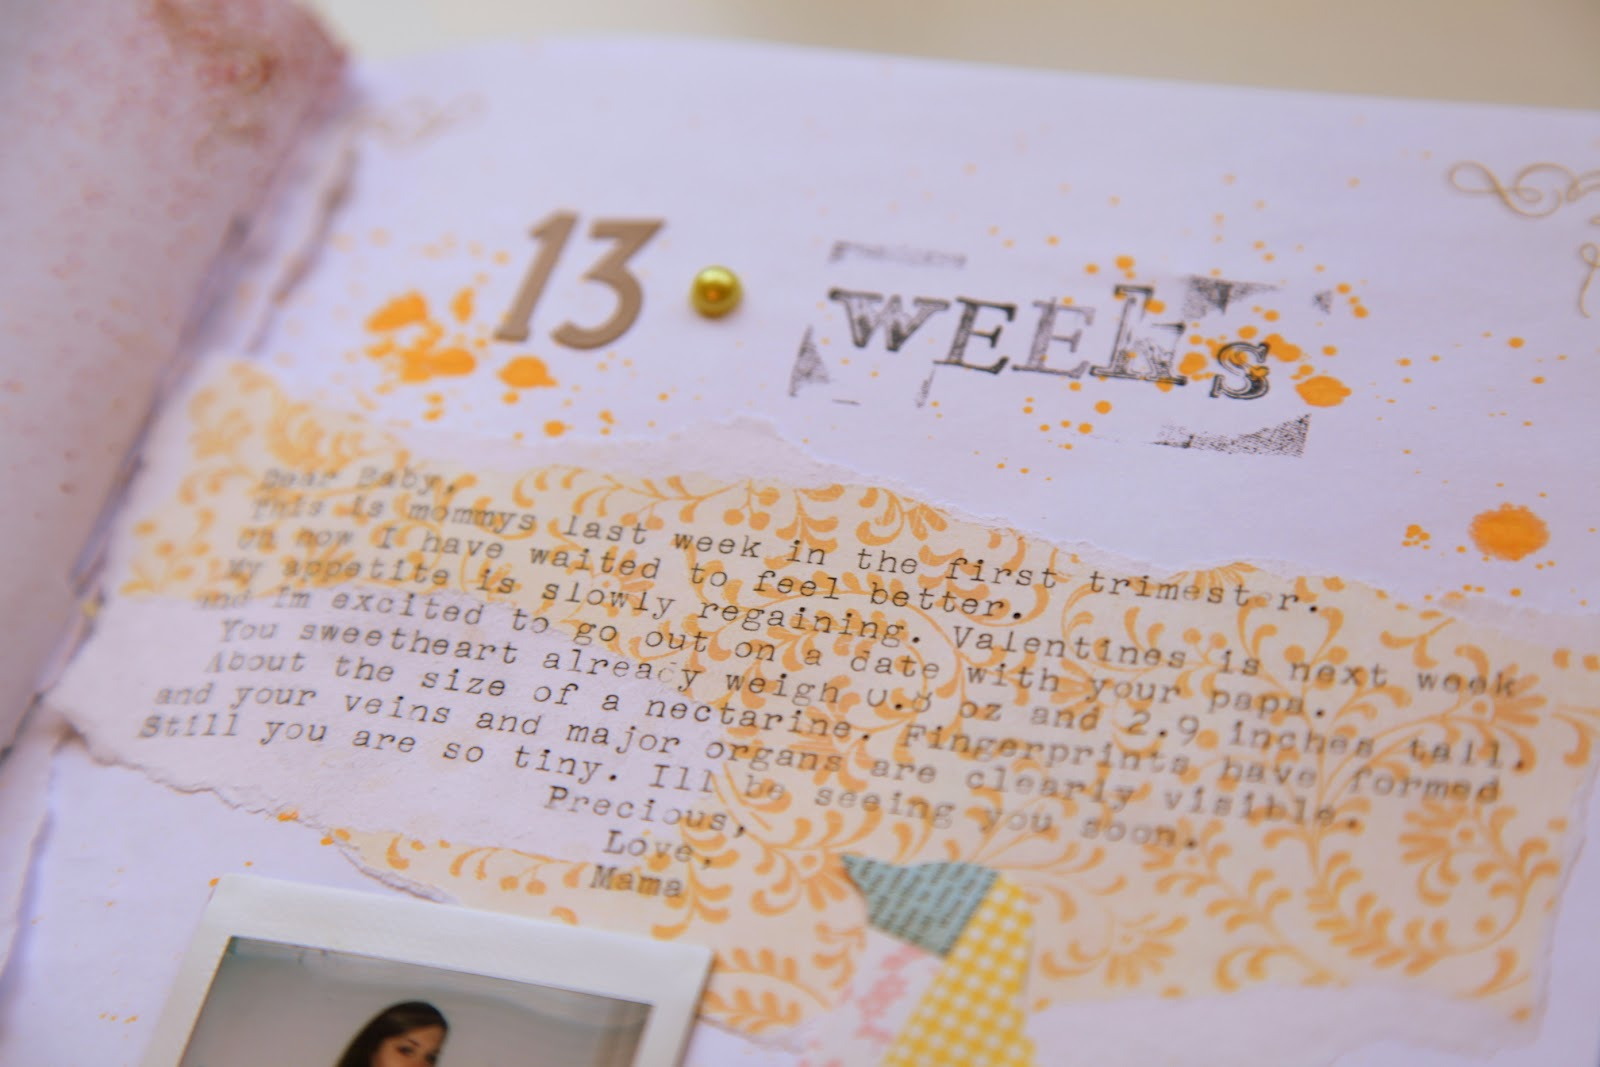 Baby journal scrapbook ideas - Pregnancy Journal